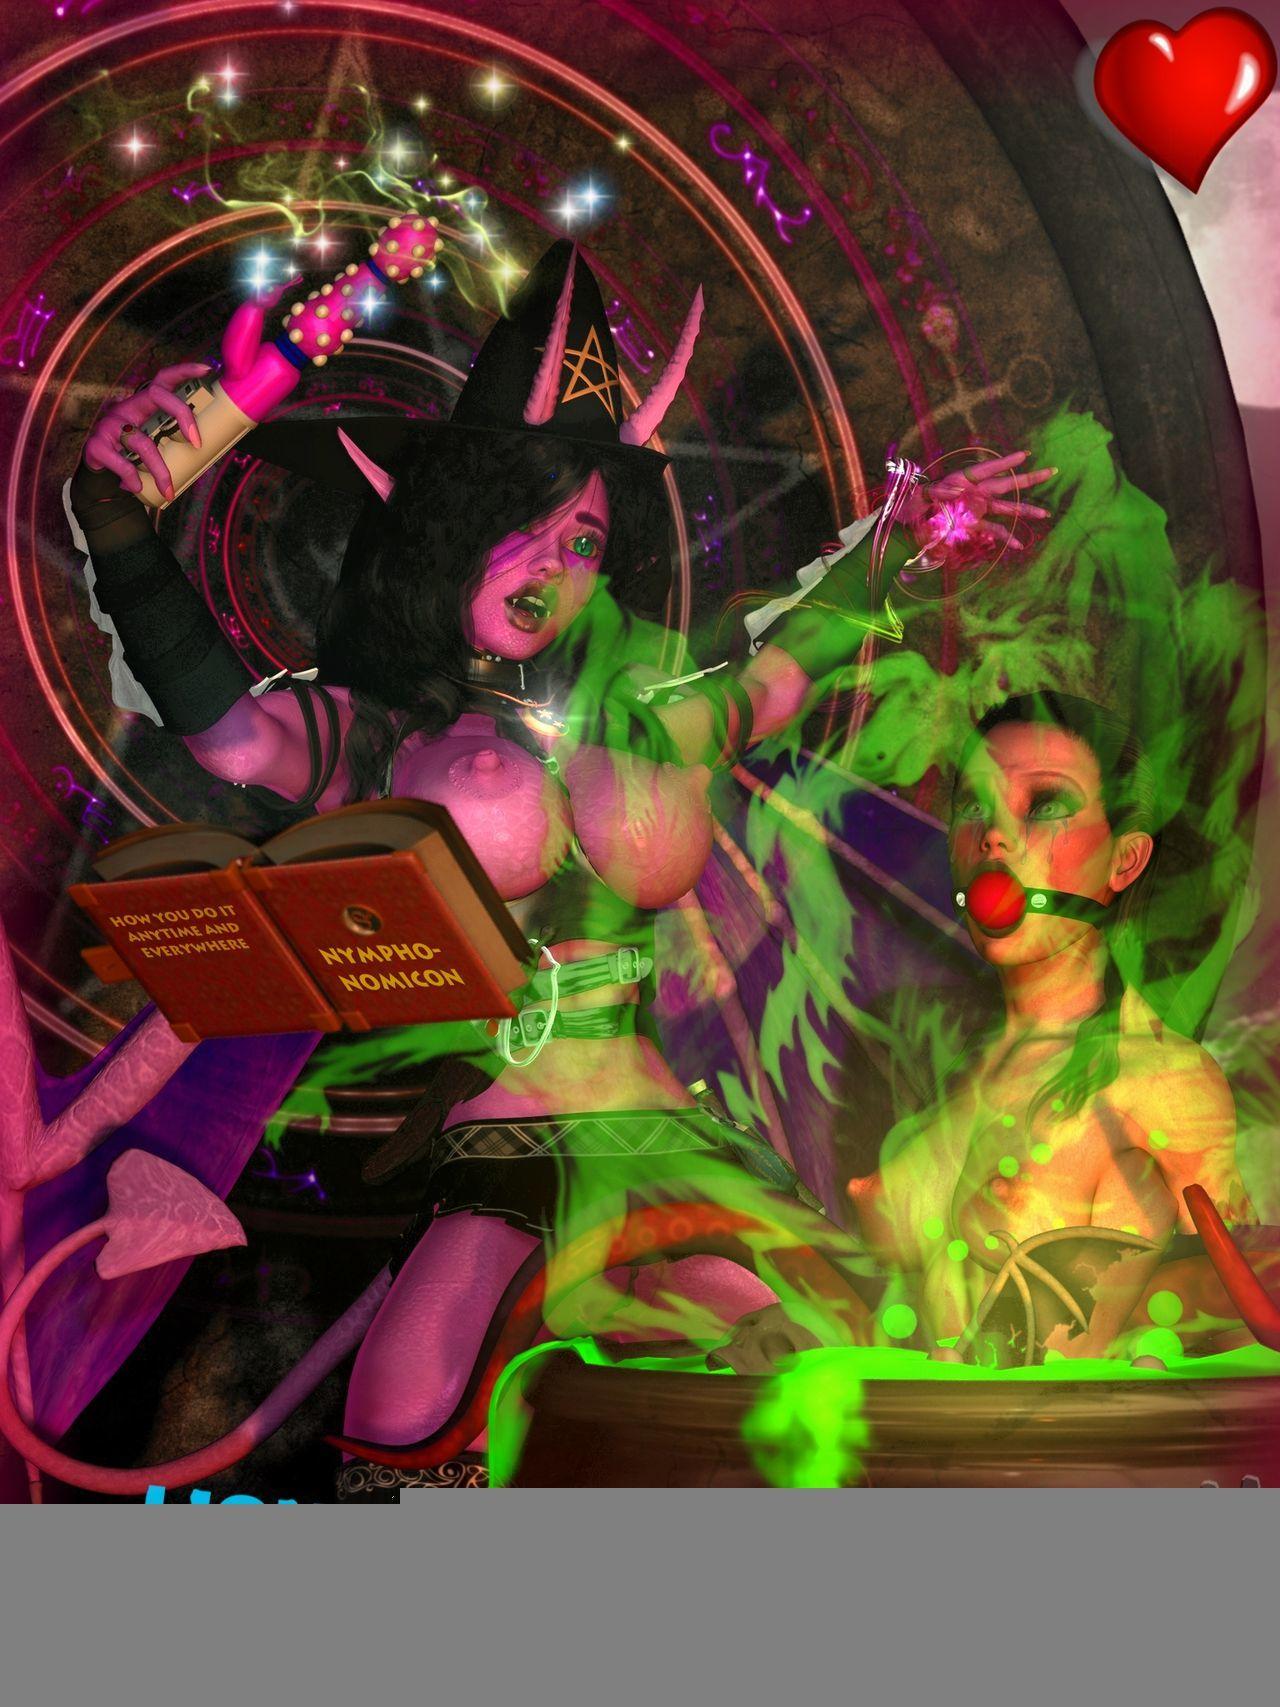 Demongirls & Scifi 3D portico - attaching 2